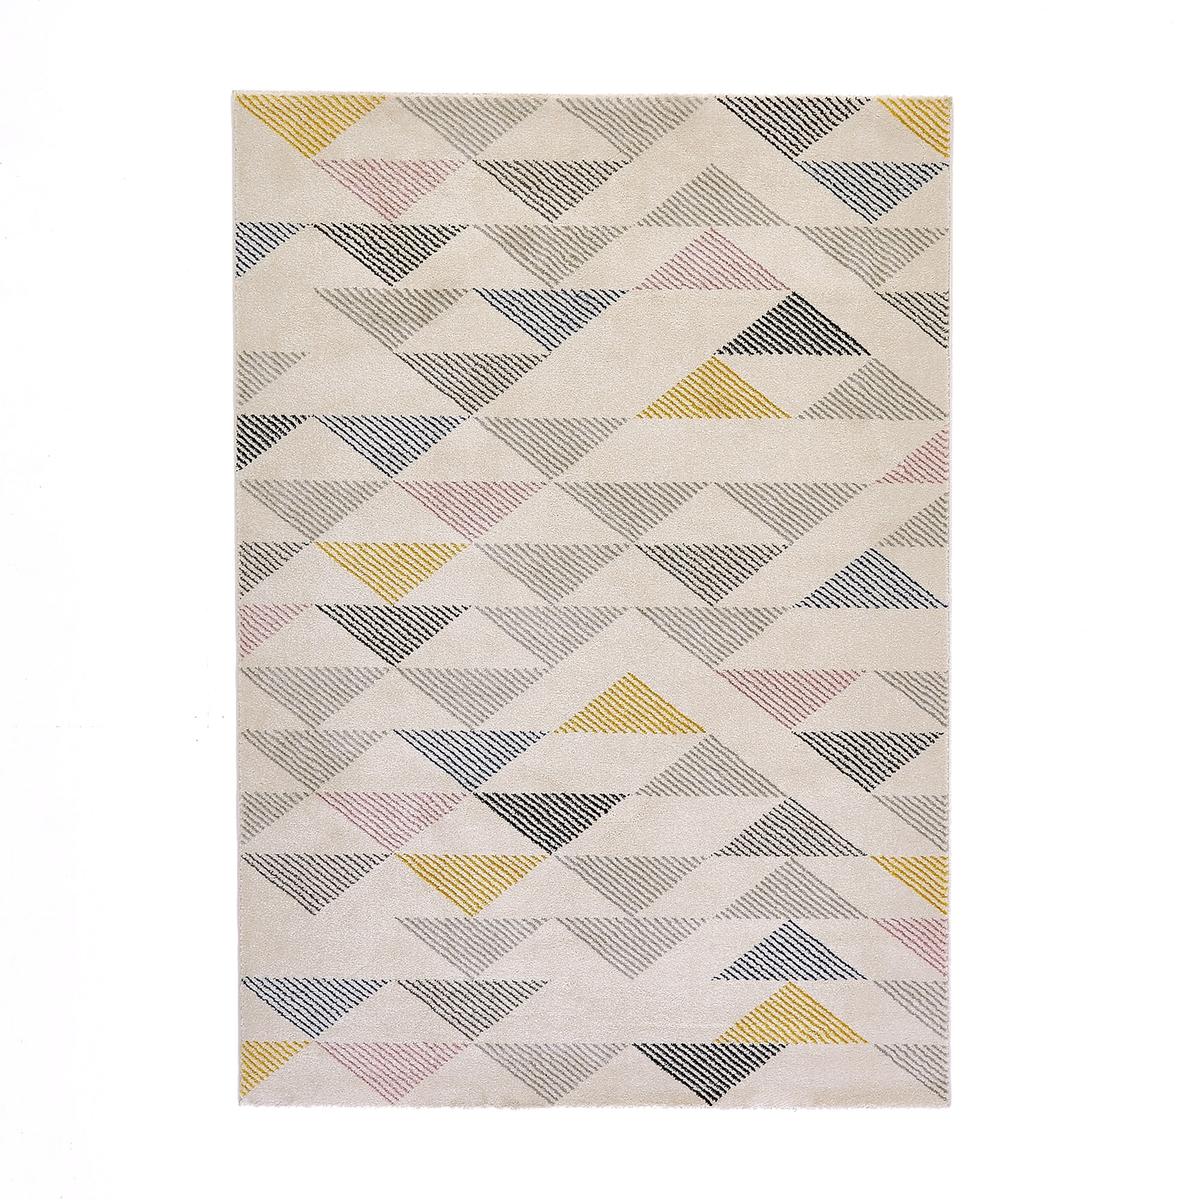 Ковер La Redoute С рисунком треугольники Jursic 120 x 170 см разноцветный ковер la redoute горизонтального плетения с рисунком цементная плитка iswik 120 x 170 см бежевый